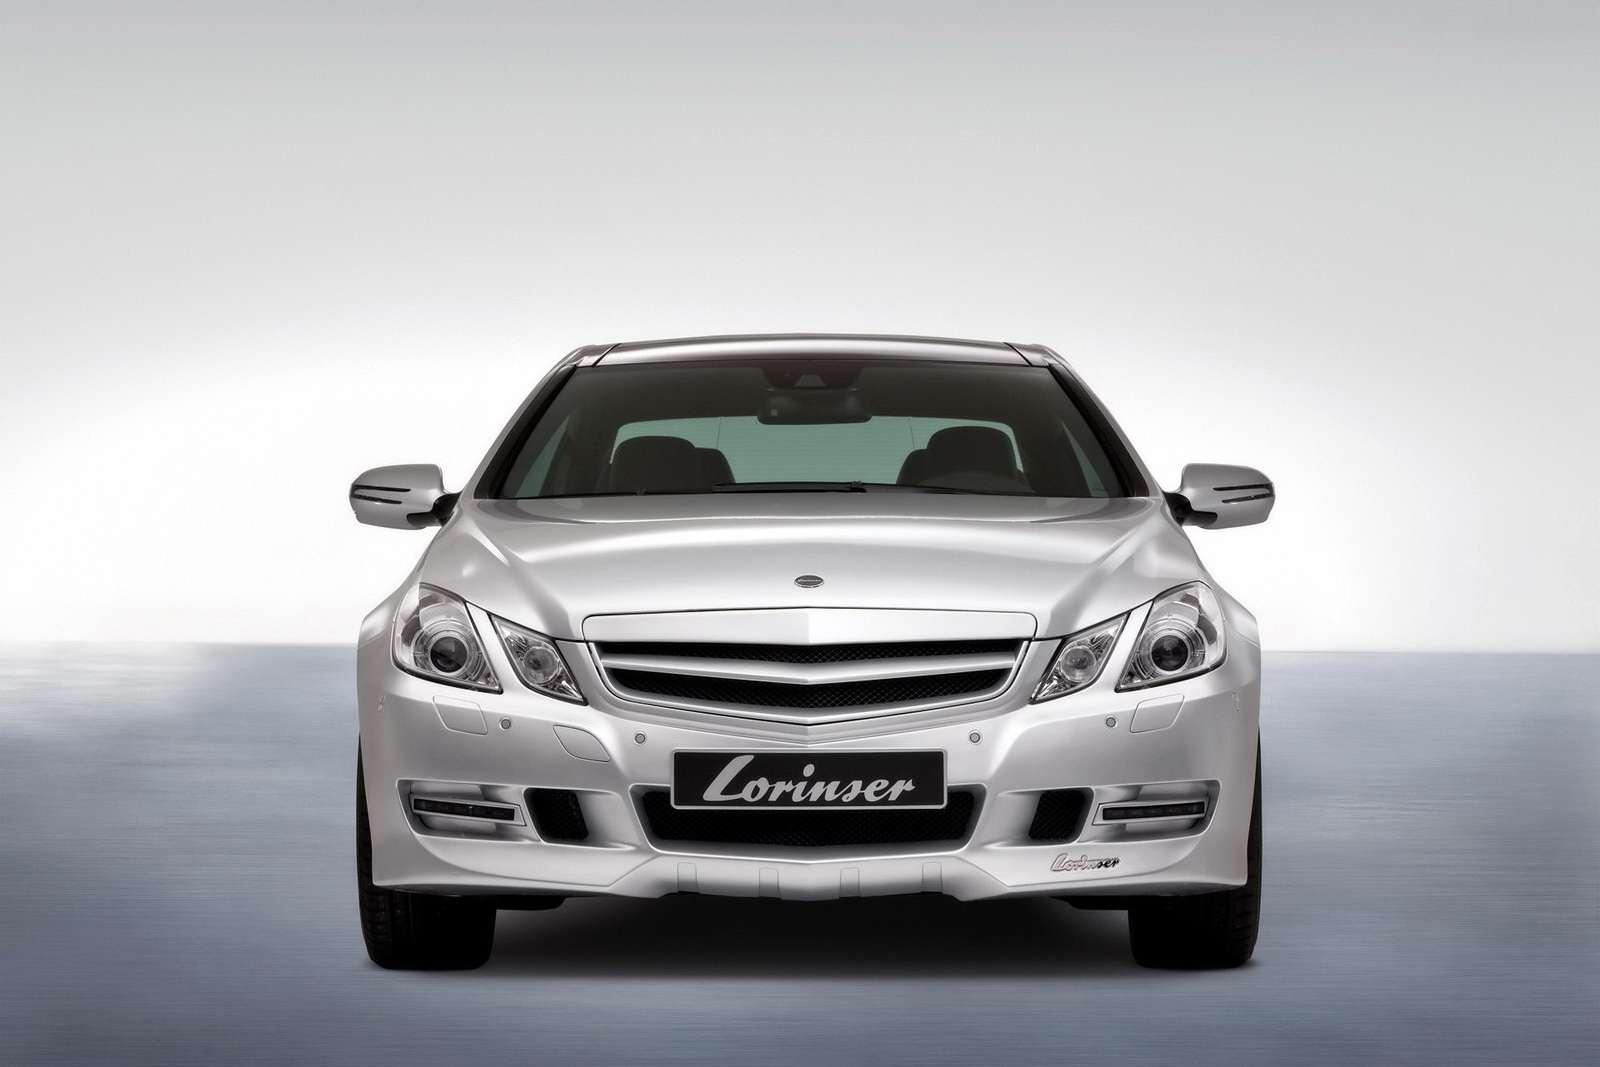 Mercedes E Coupe Lorinser 2010